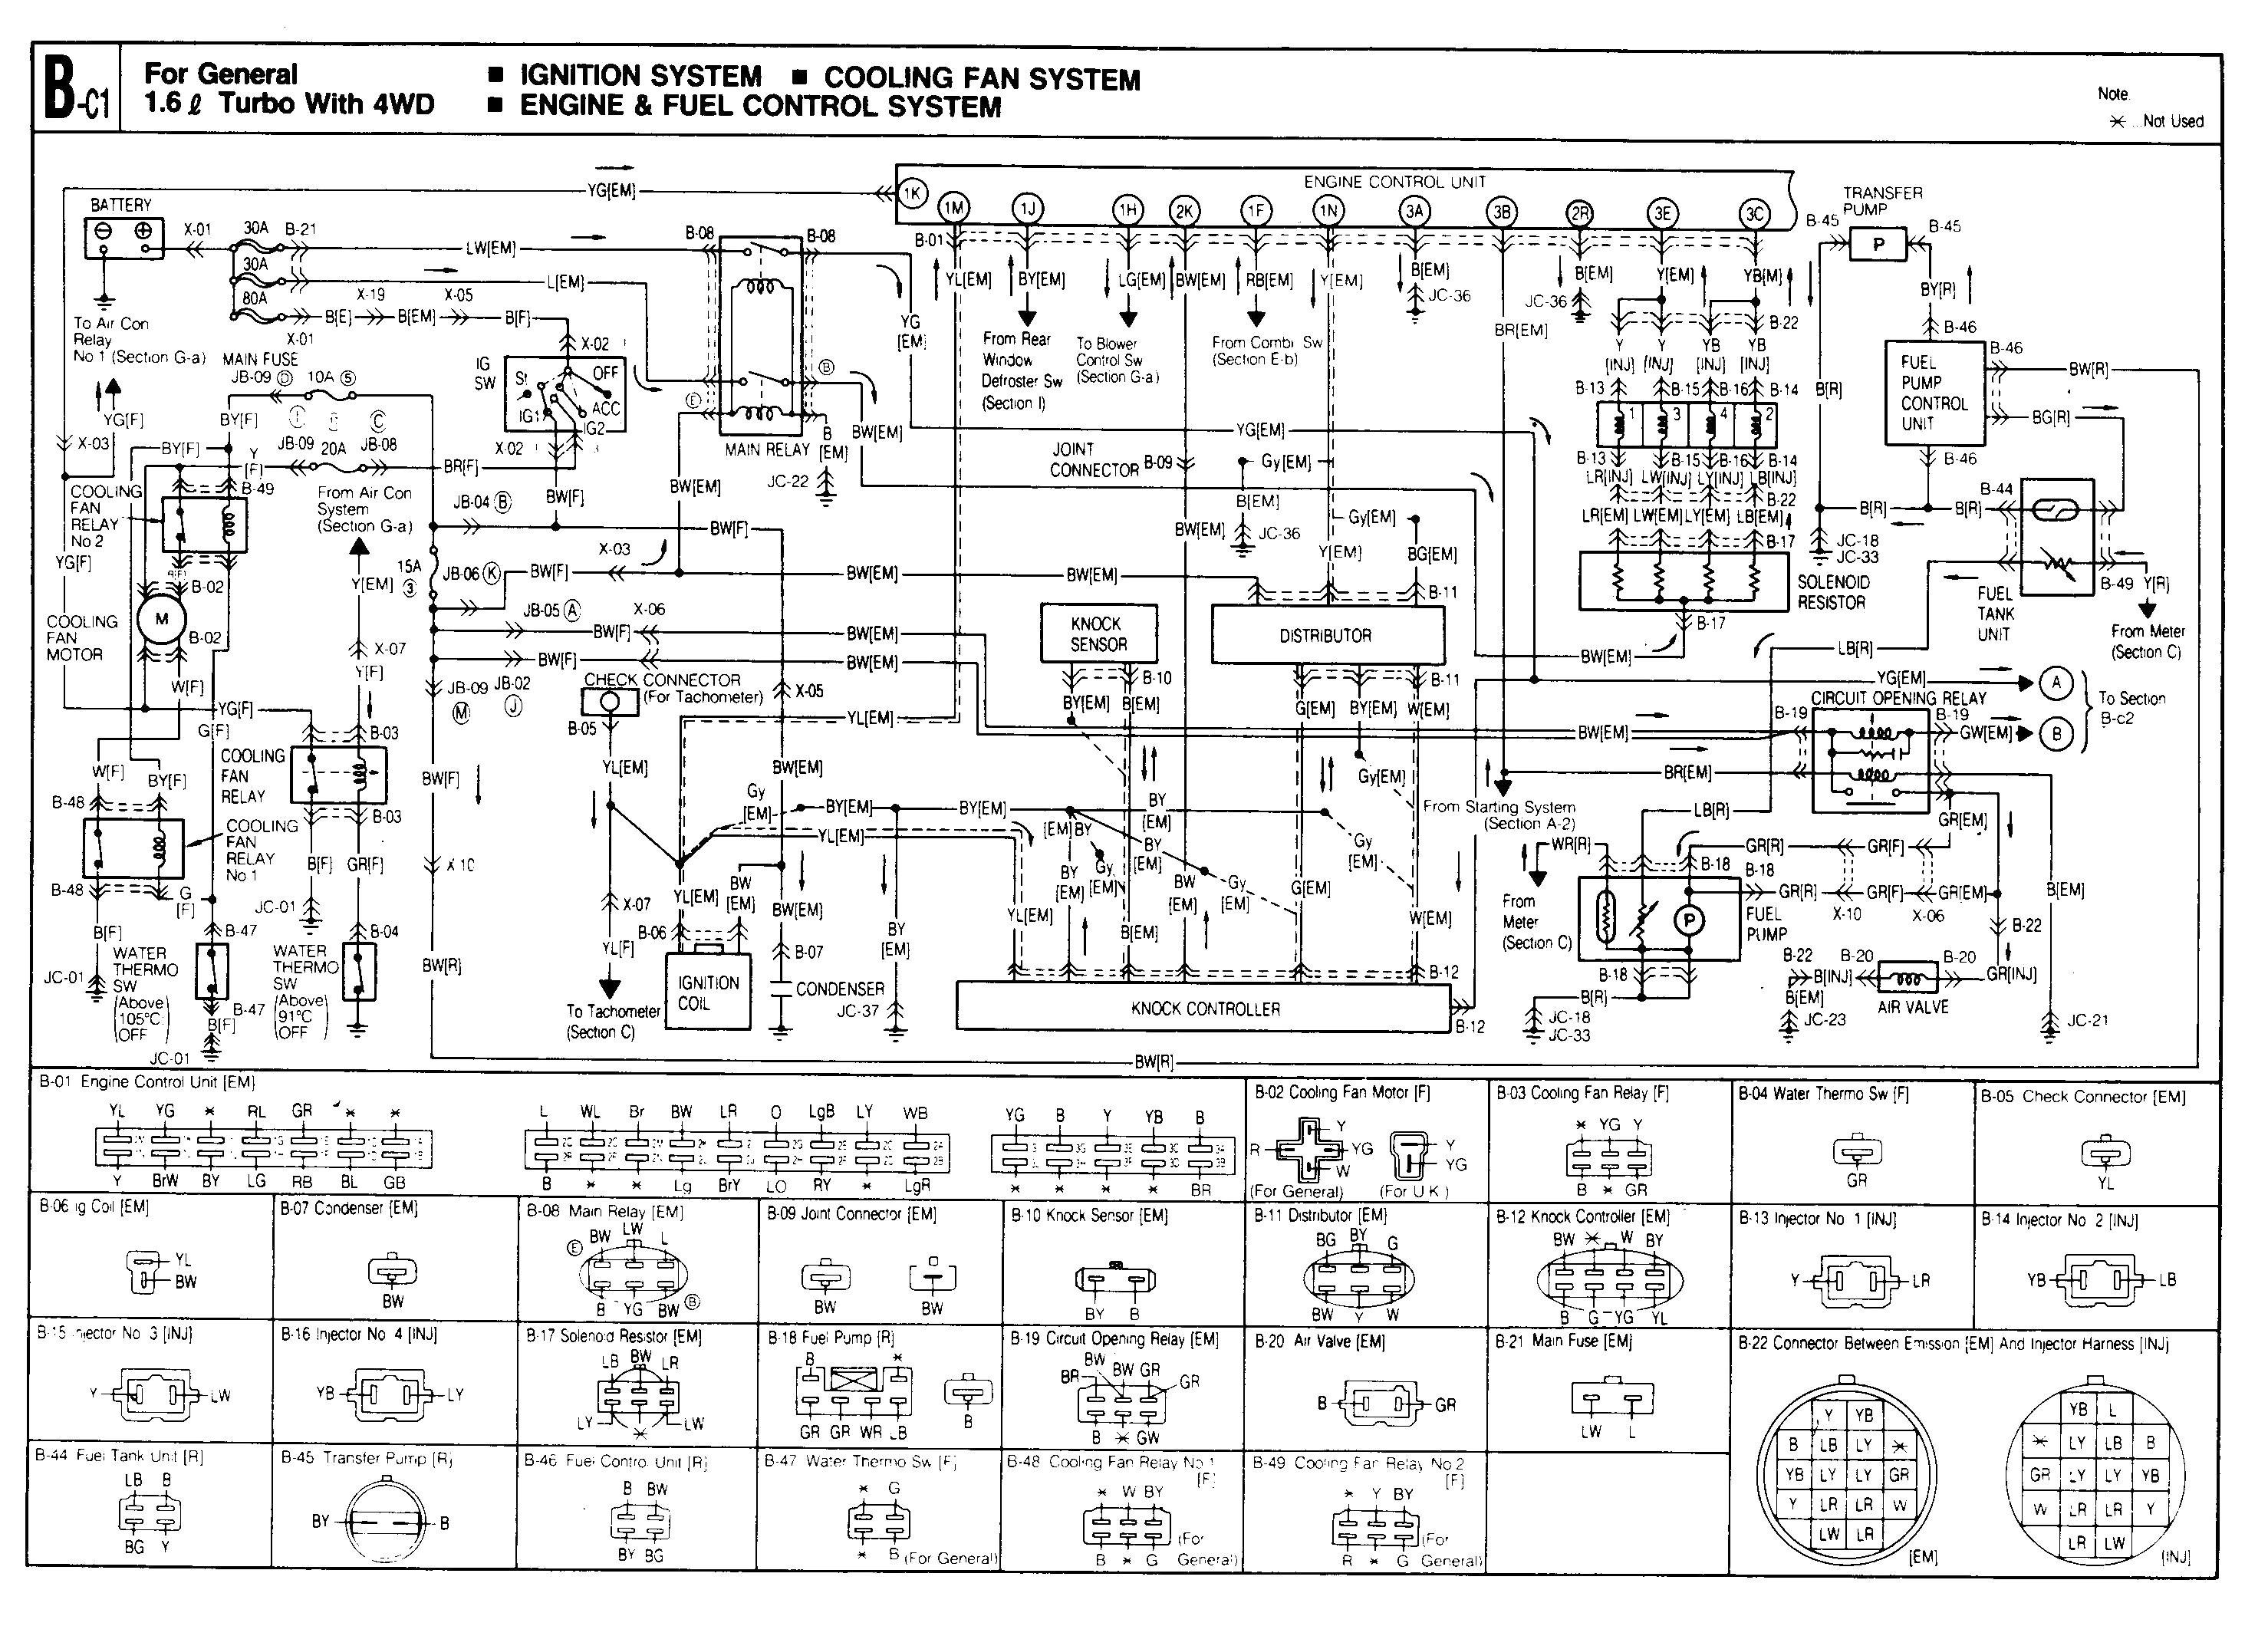 2010 pontiac vibe radio wiring diagram cat 6 wire mazda mpv engine